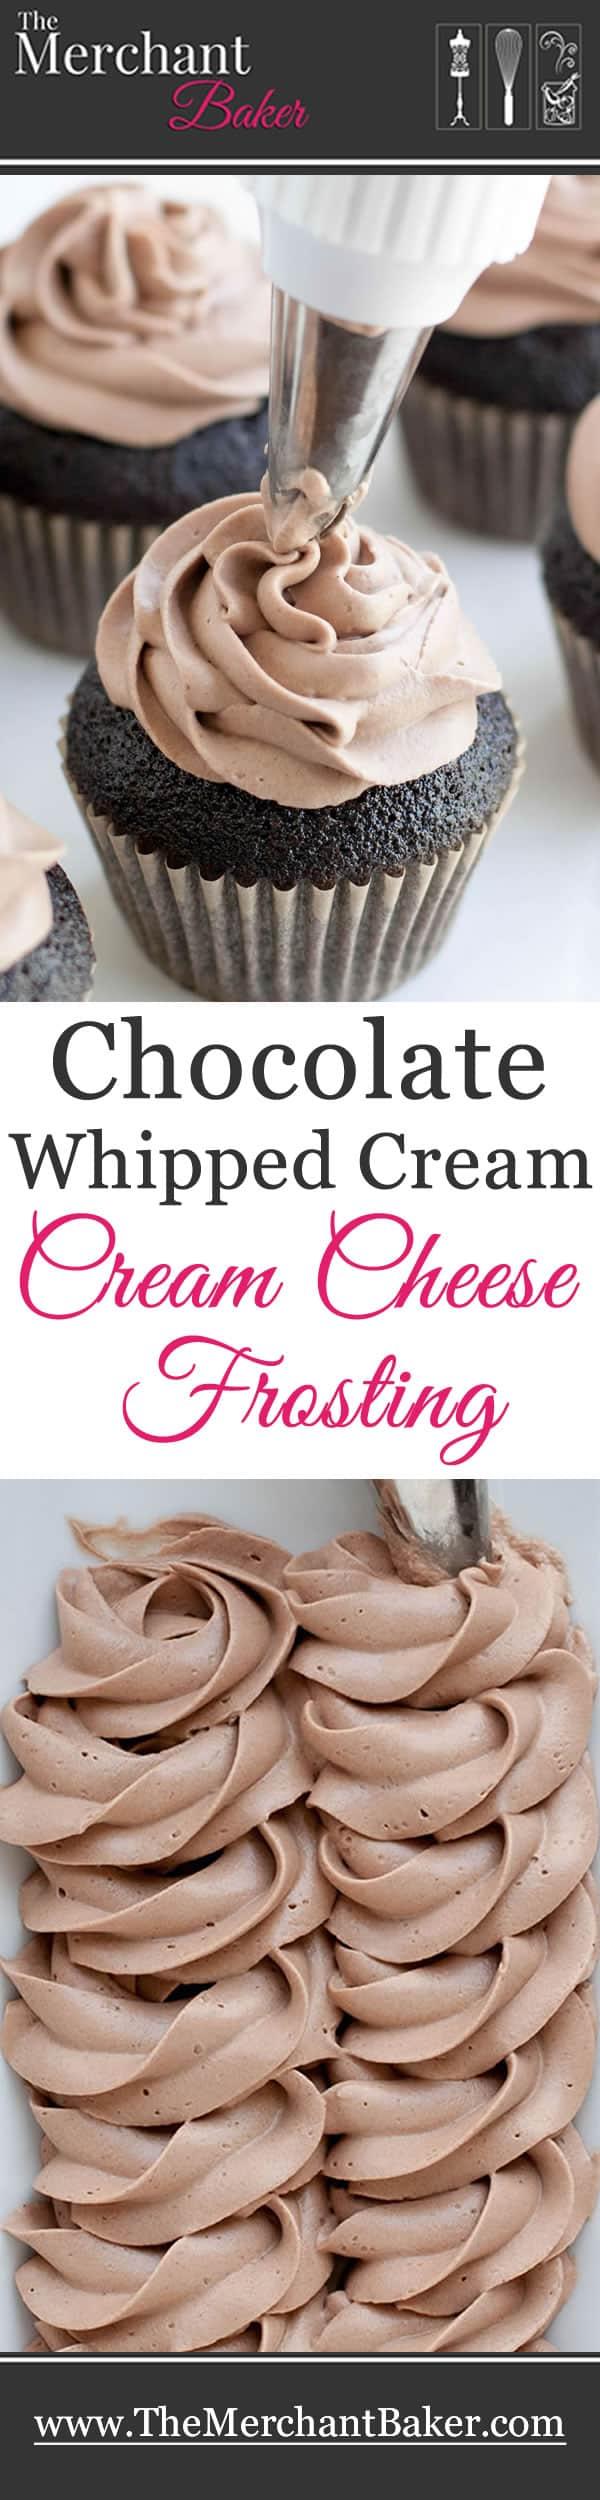 Chocolate Whipped Cream Cream Cheese Frosting